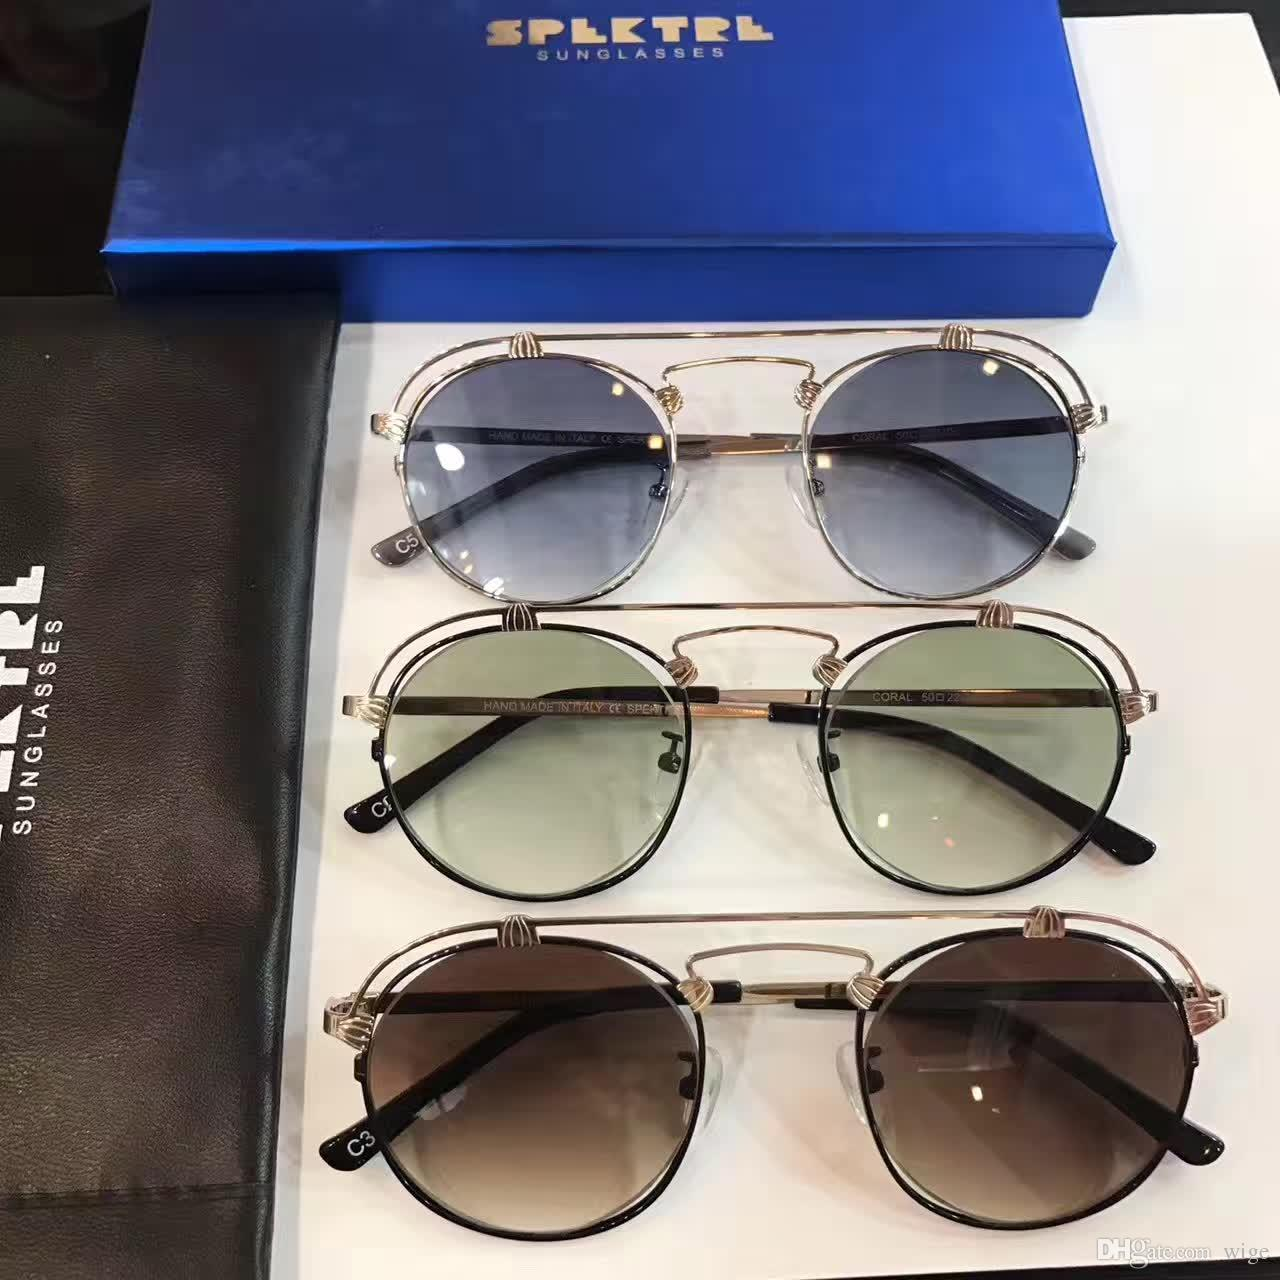 Women Designer Spektre Coral Sunglasses Gold/Black Brown Gradient 50mm Sunglass Luxury Brand Retro Round Sunglasses New with Case